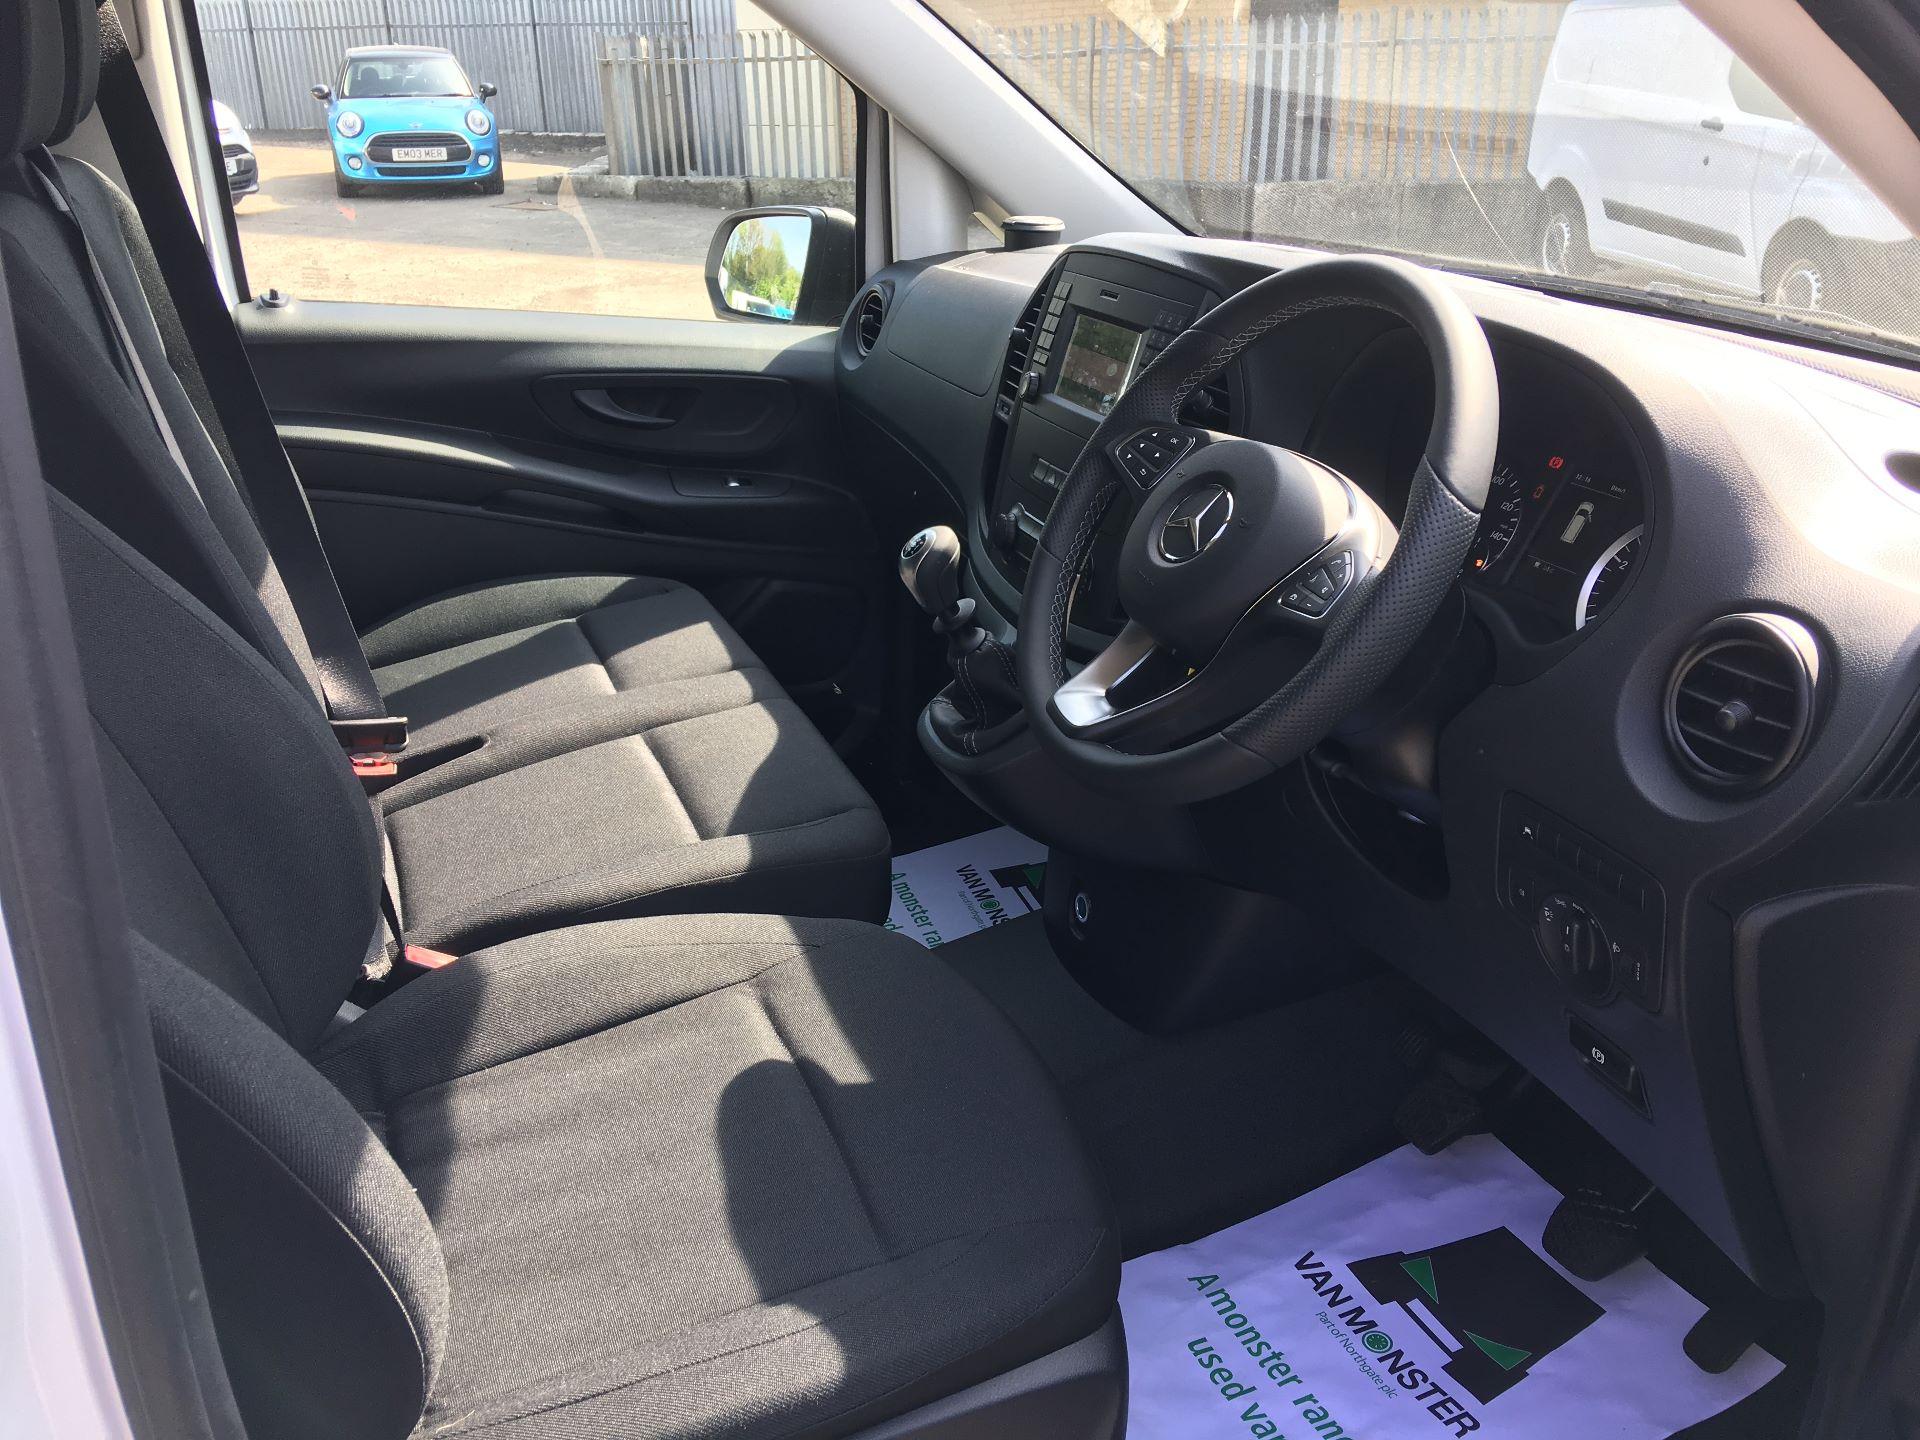 2019 Mercedes-Benz Vito LONG 111 CDI VAN EURO 5/6 (YM19HFZ) Image 2